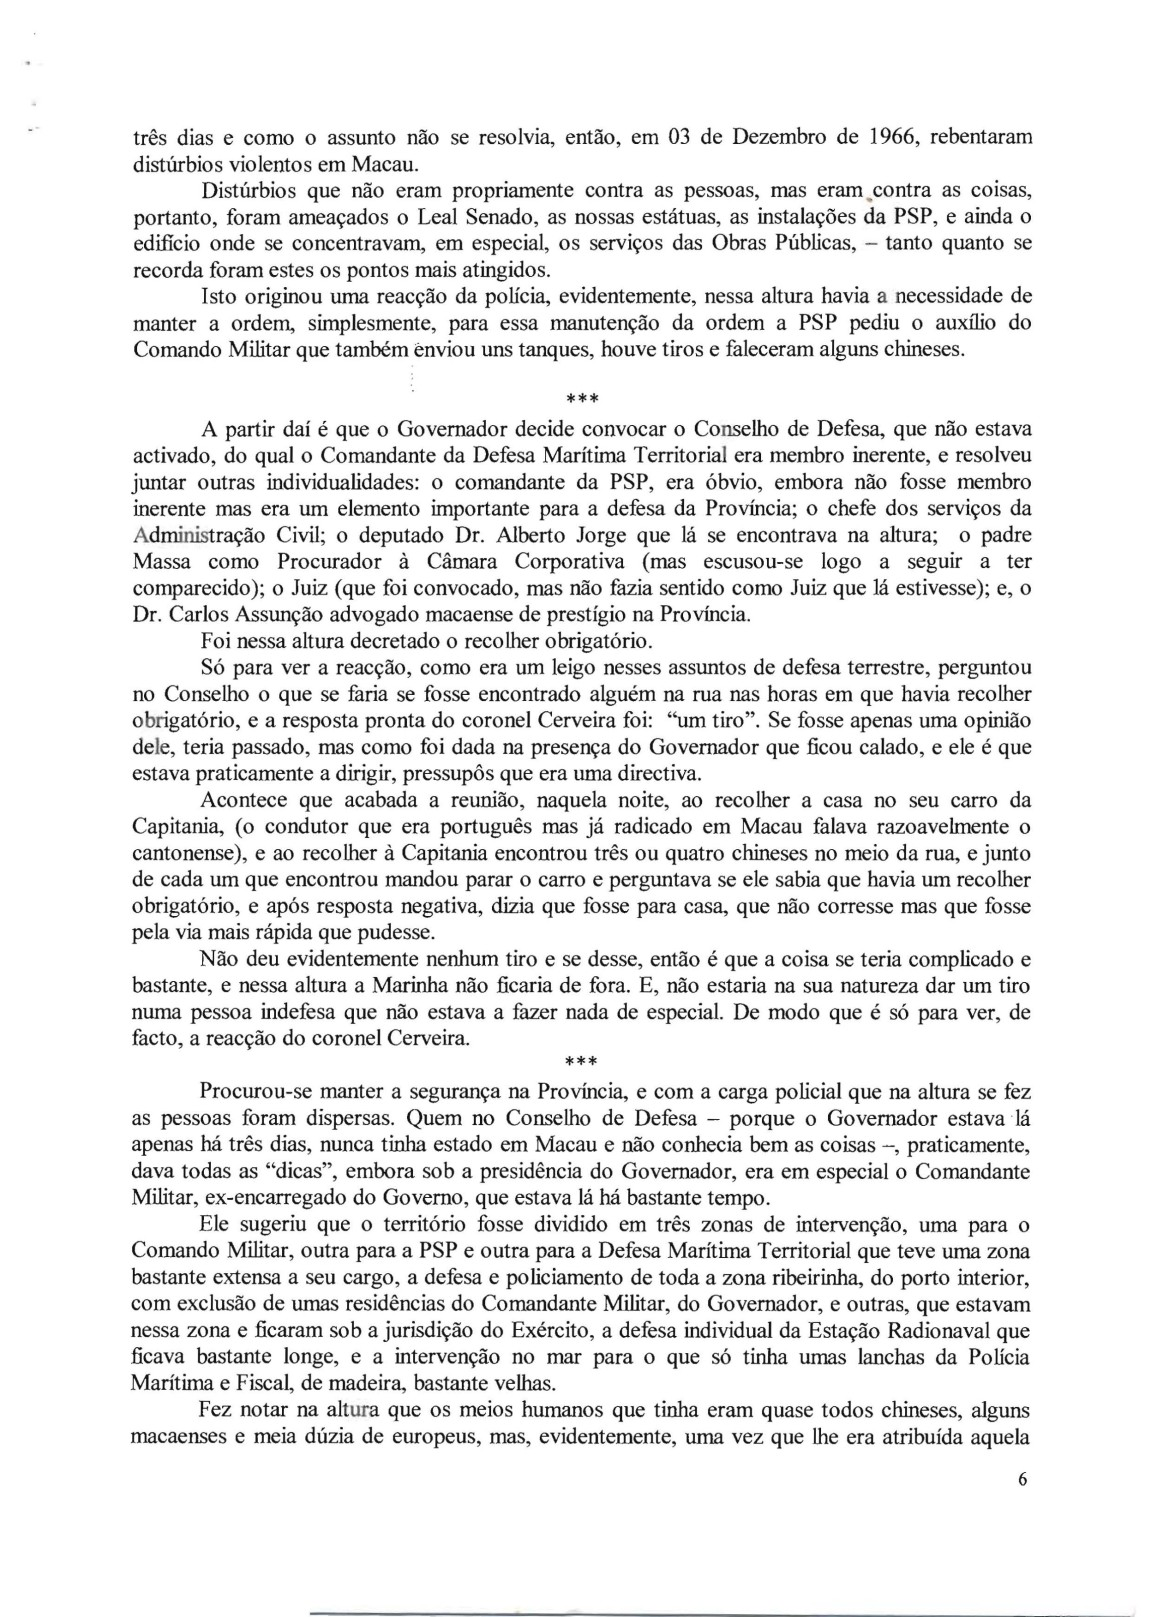 00471 01-03-28 Academia de Marinha-Entrevista do Alm Nunes da Silva pg 6 de 12